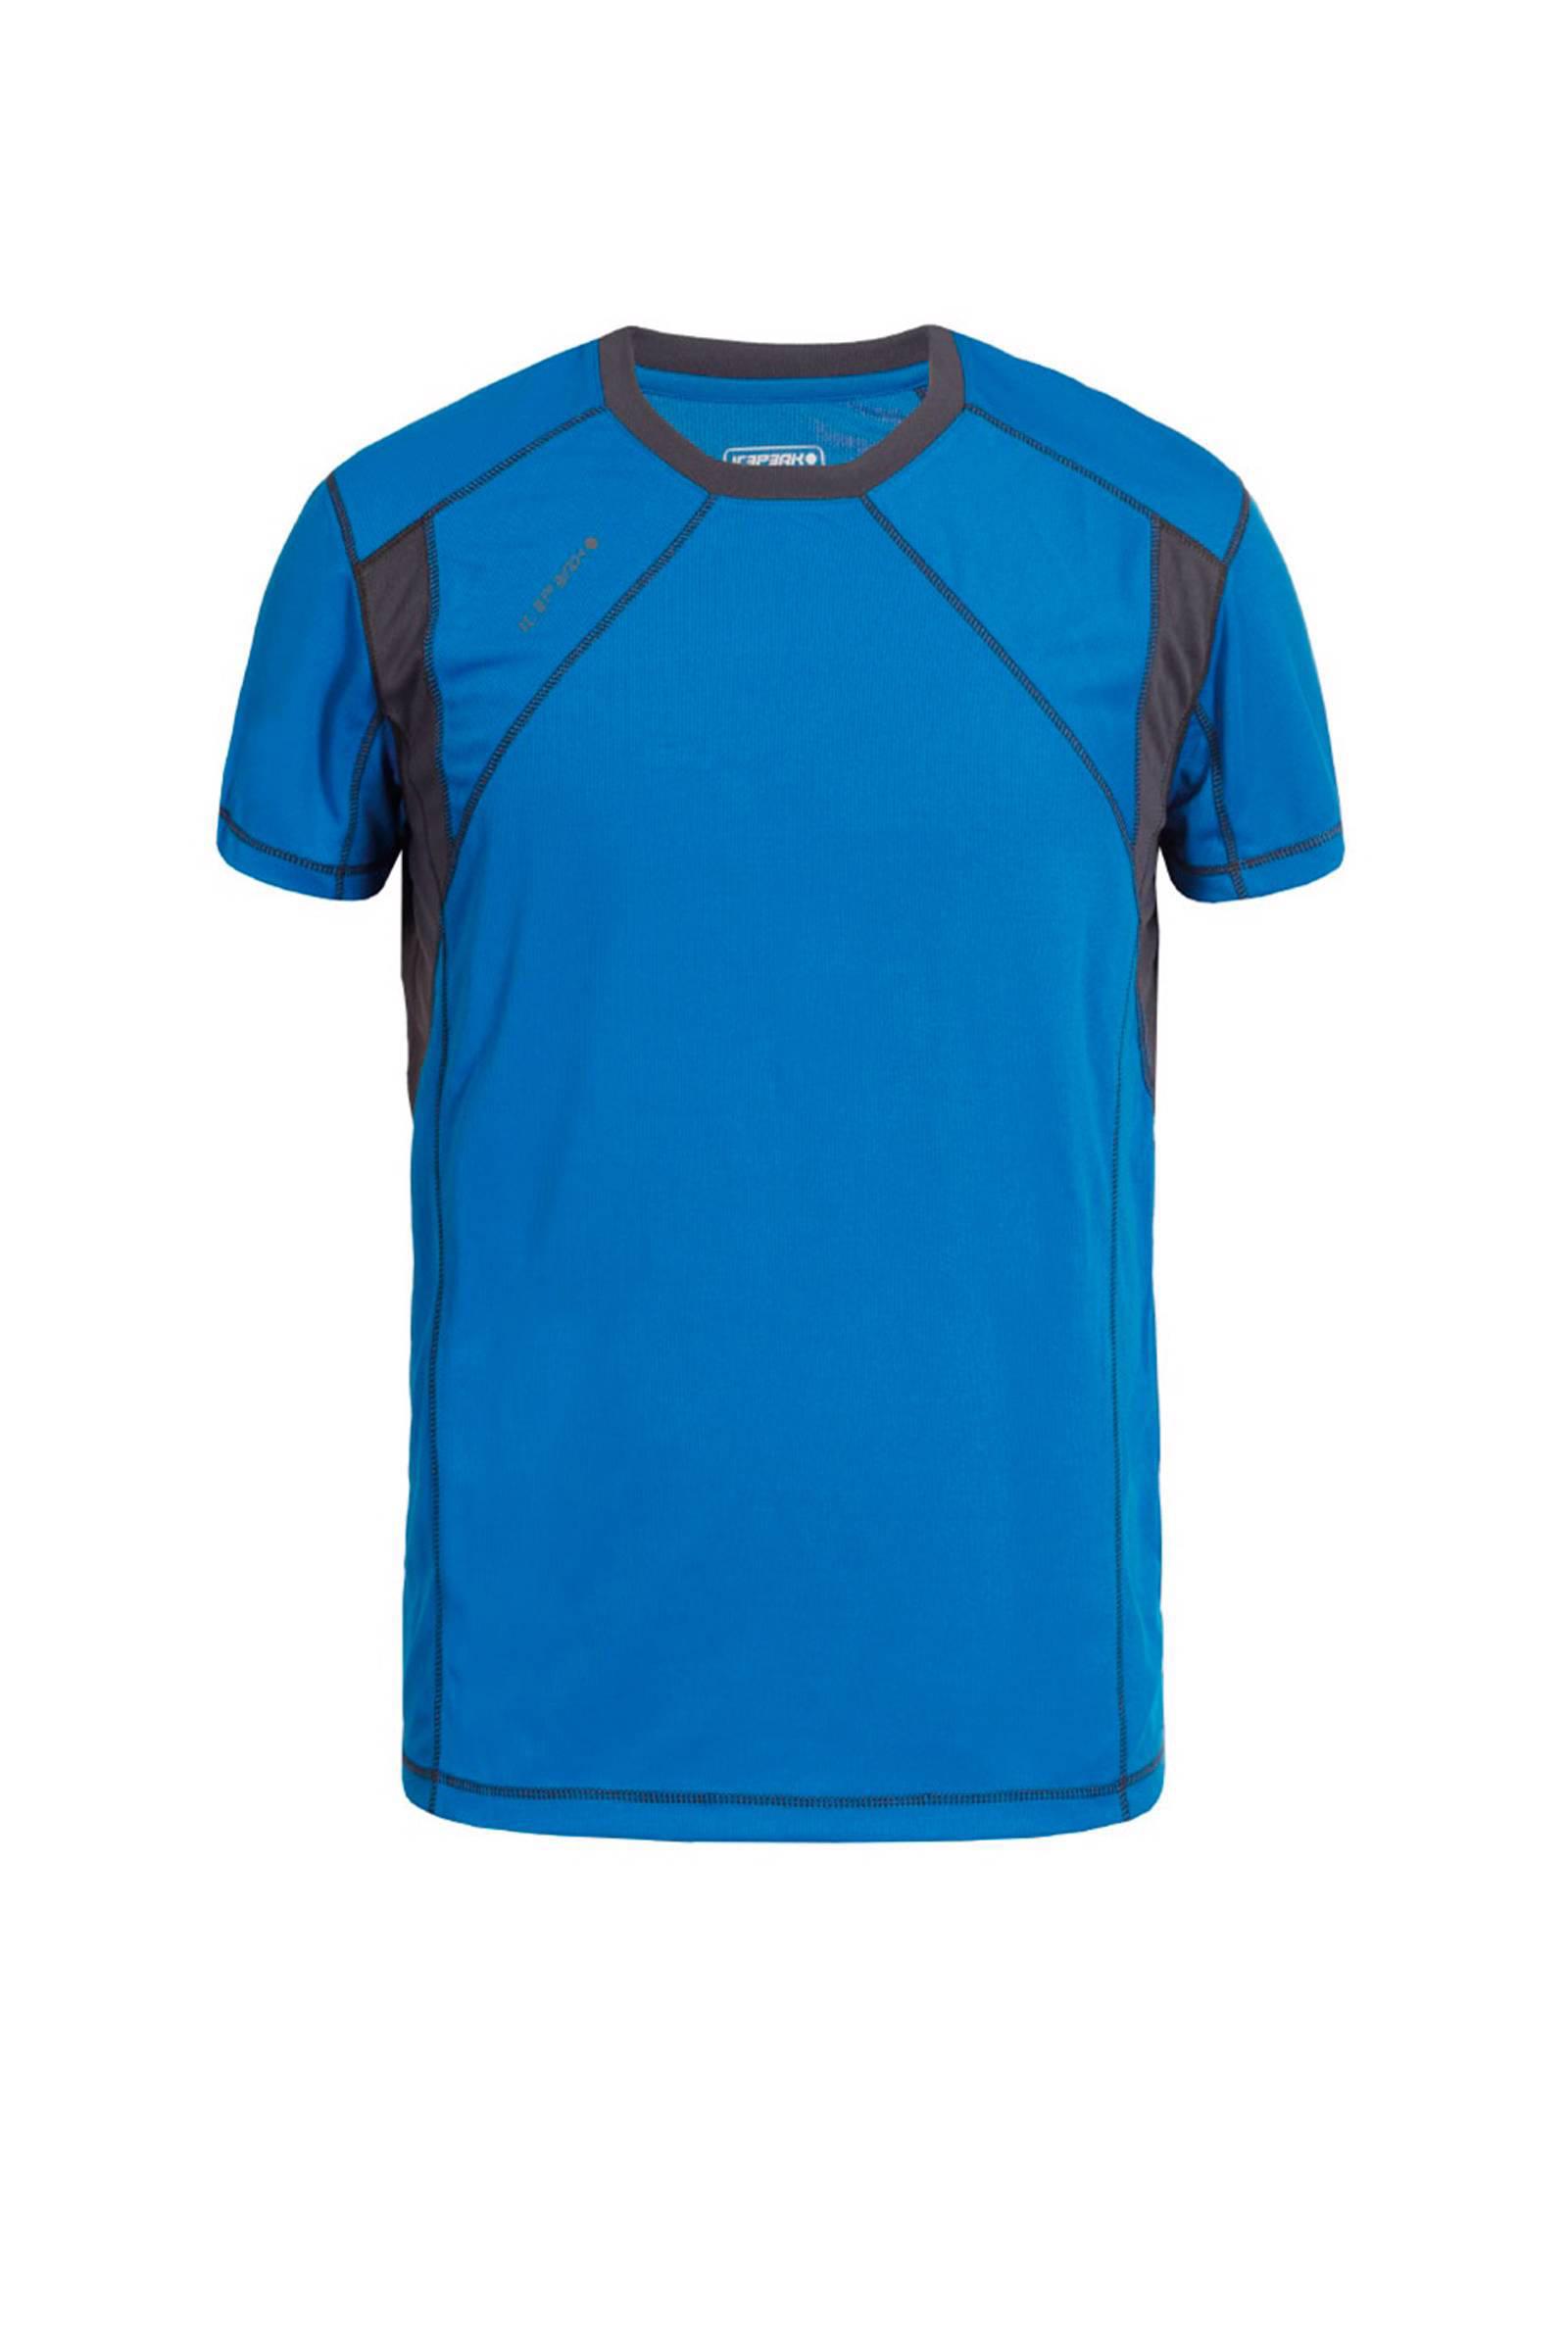 Icepeak outdoor T shirt T outdoor Icepeak shirt wR7vav